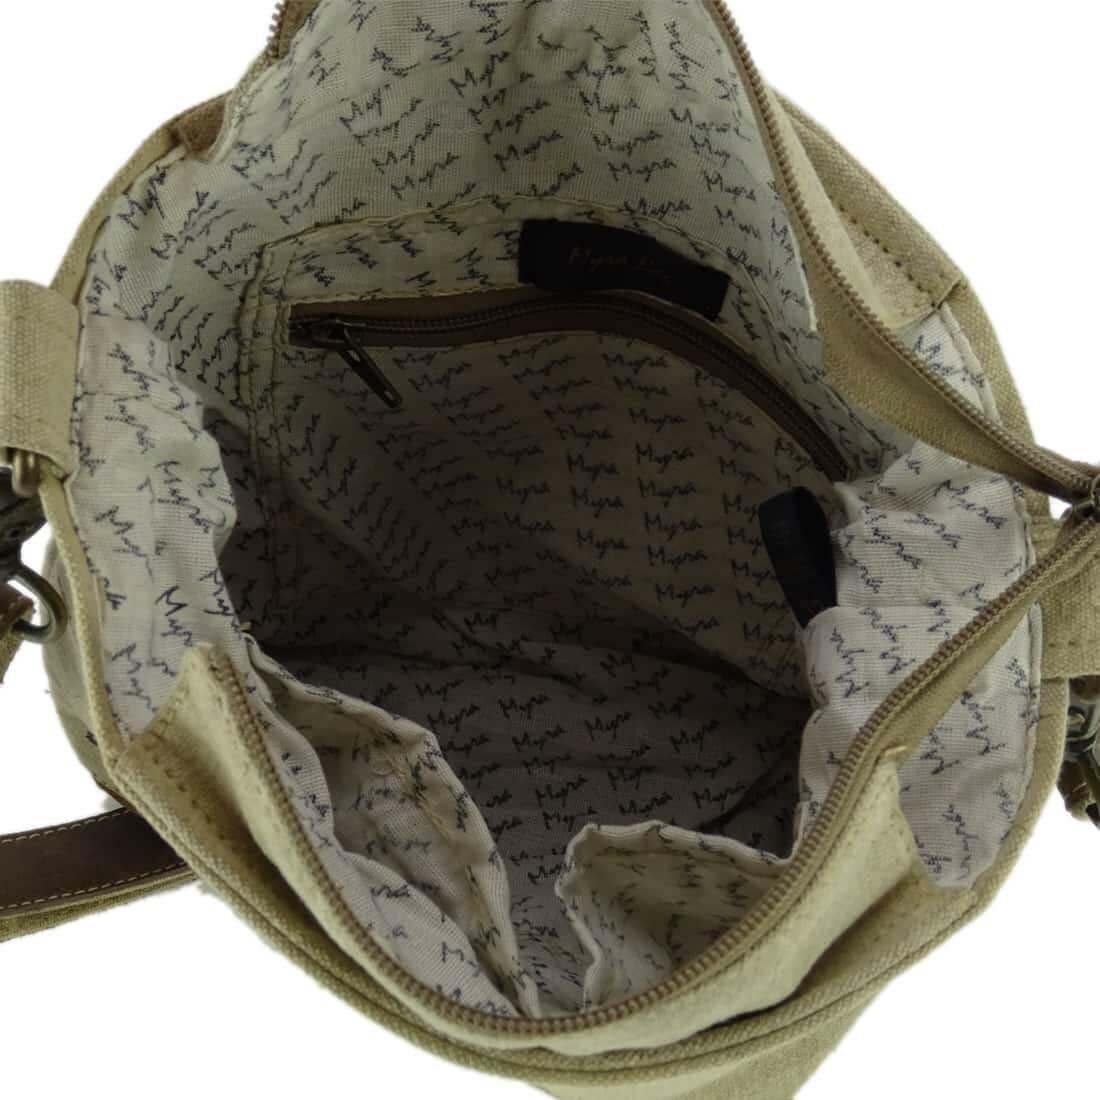 Myra Bag Schoudertas Isabelle binnenkant